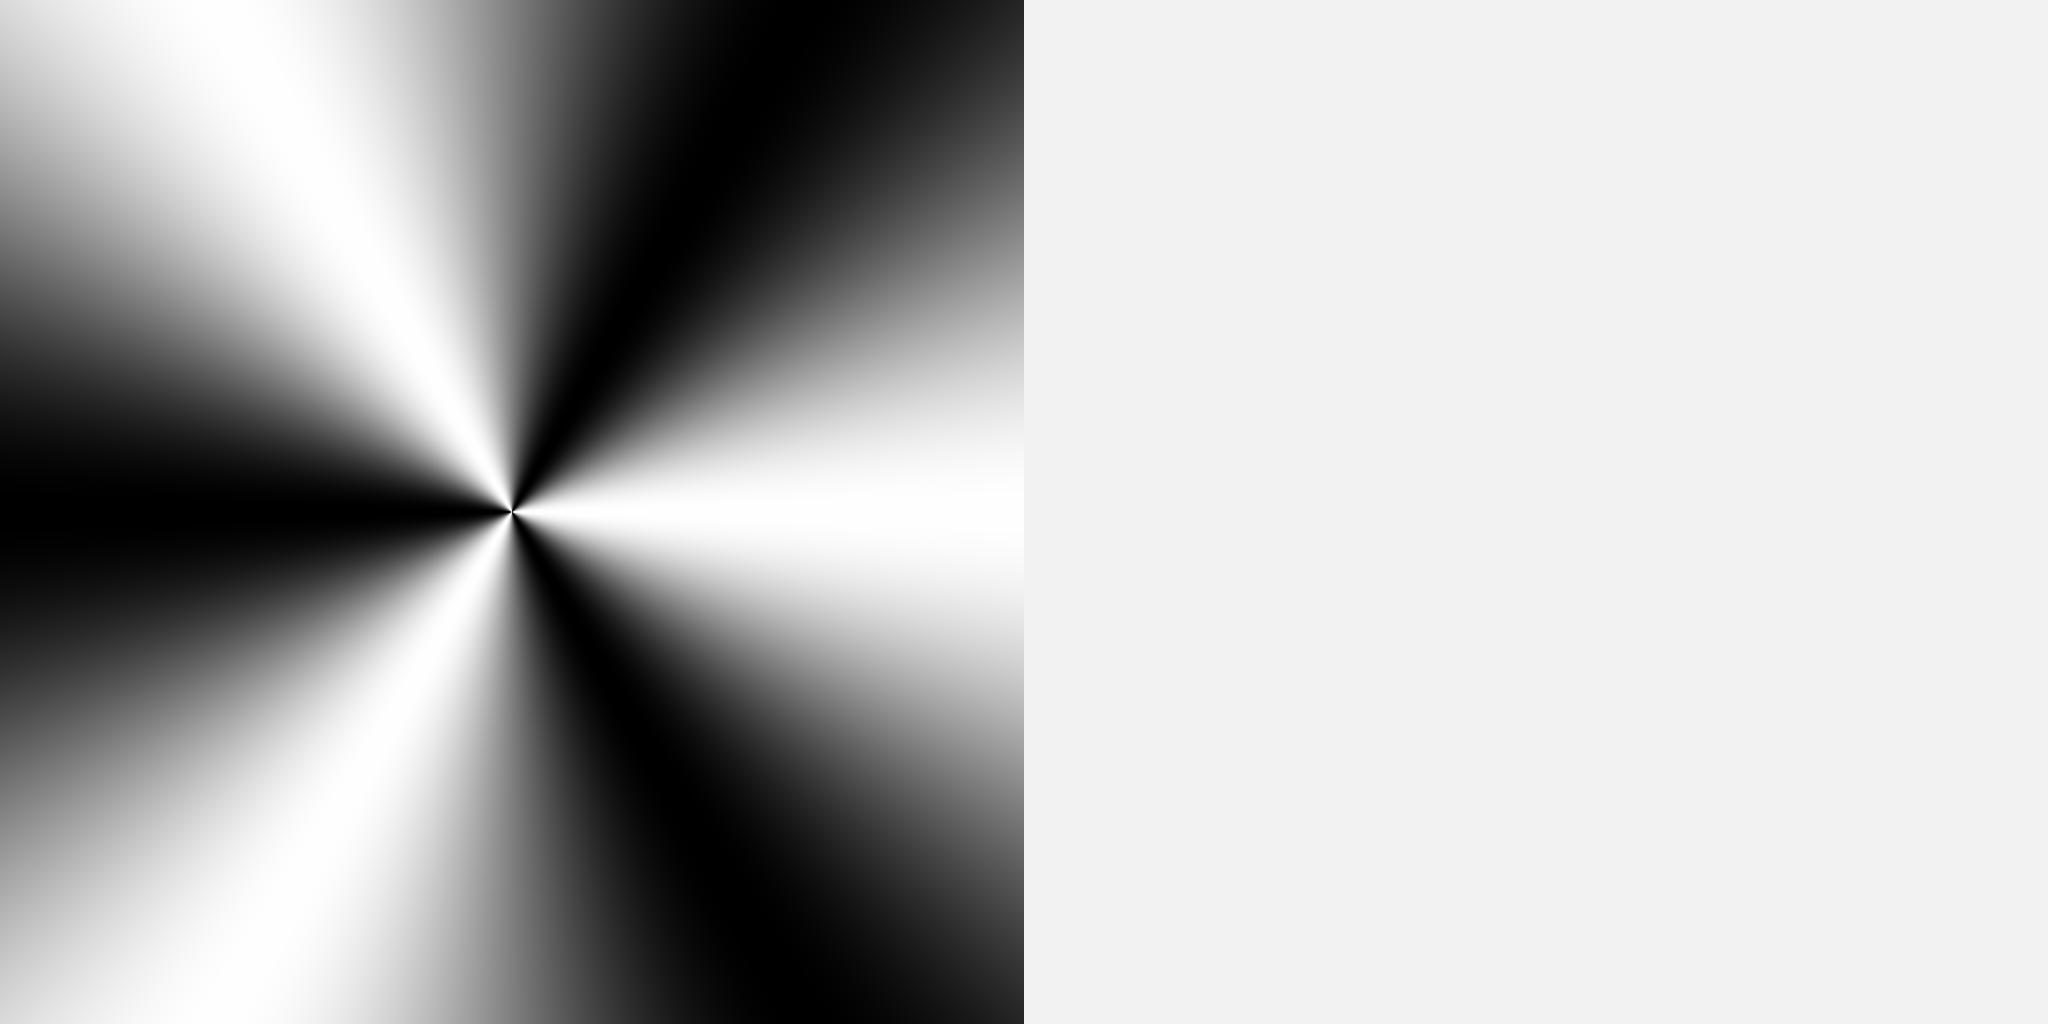 Poisson Image Editing